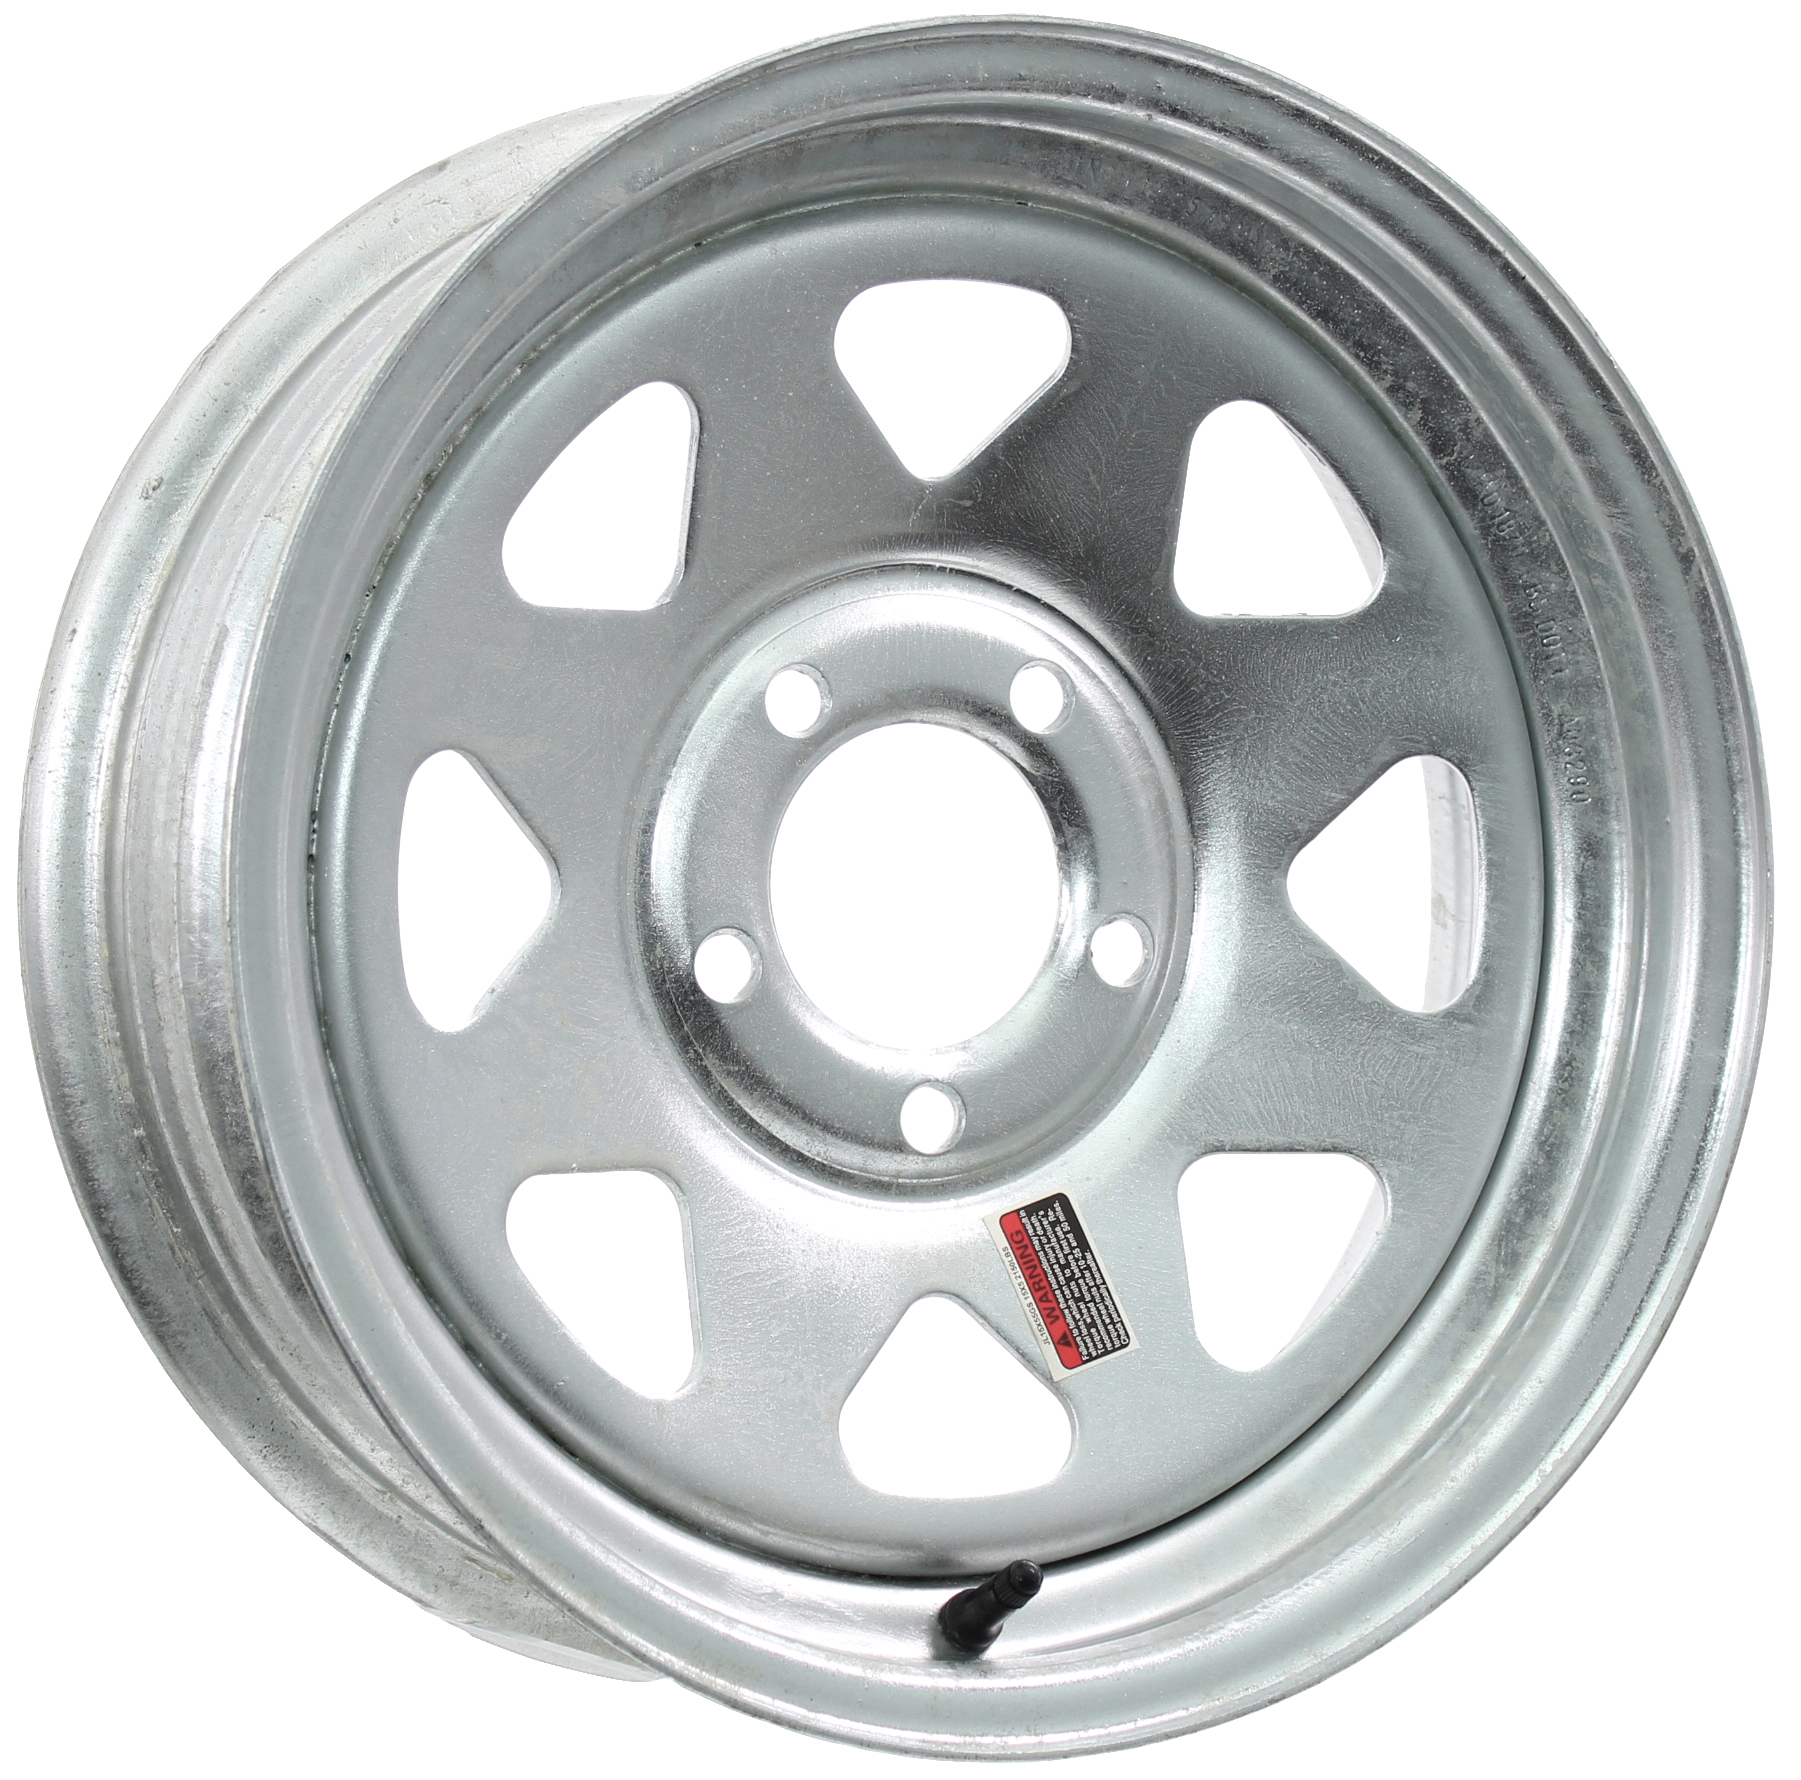 15x6 5-4.5 Galvanized Spoke Steel Trailer Wheel Image